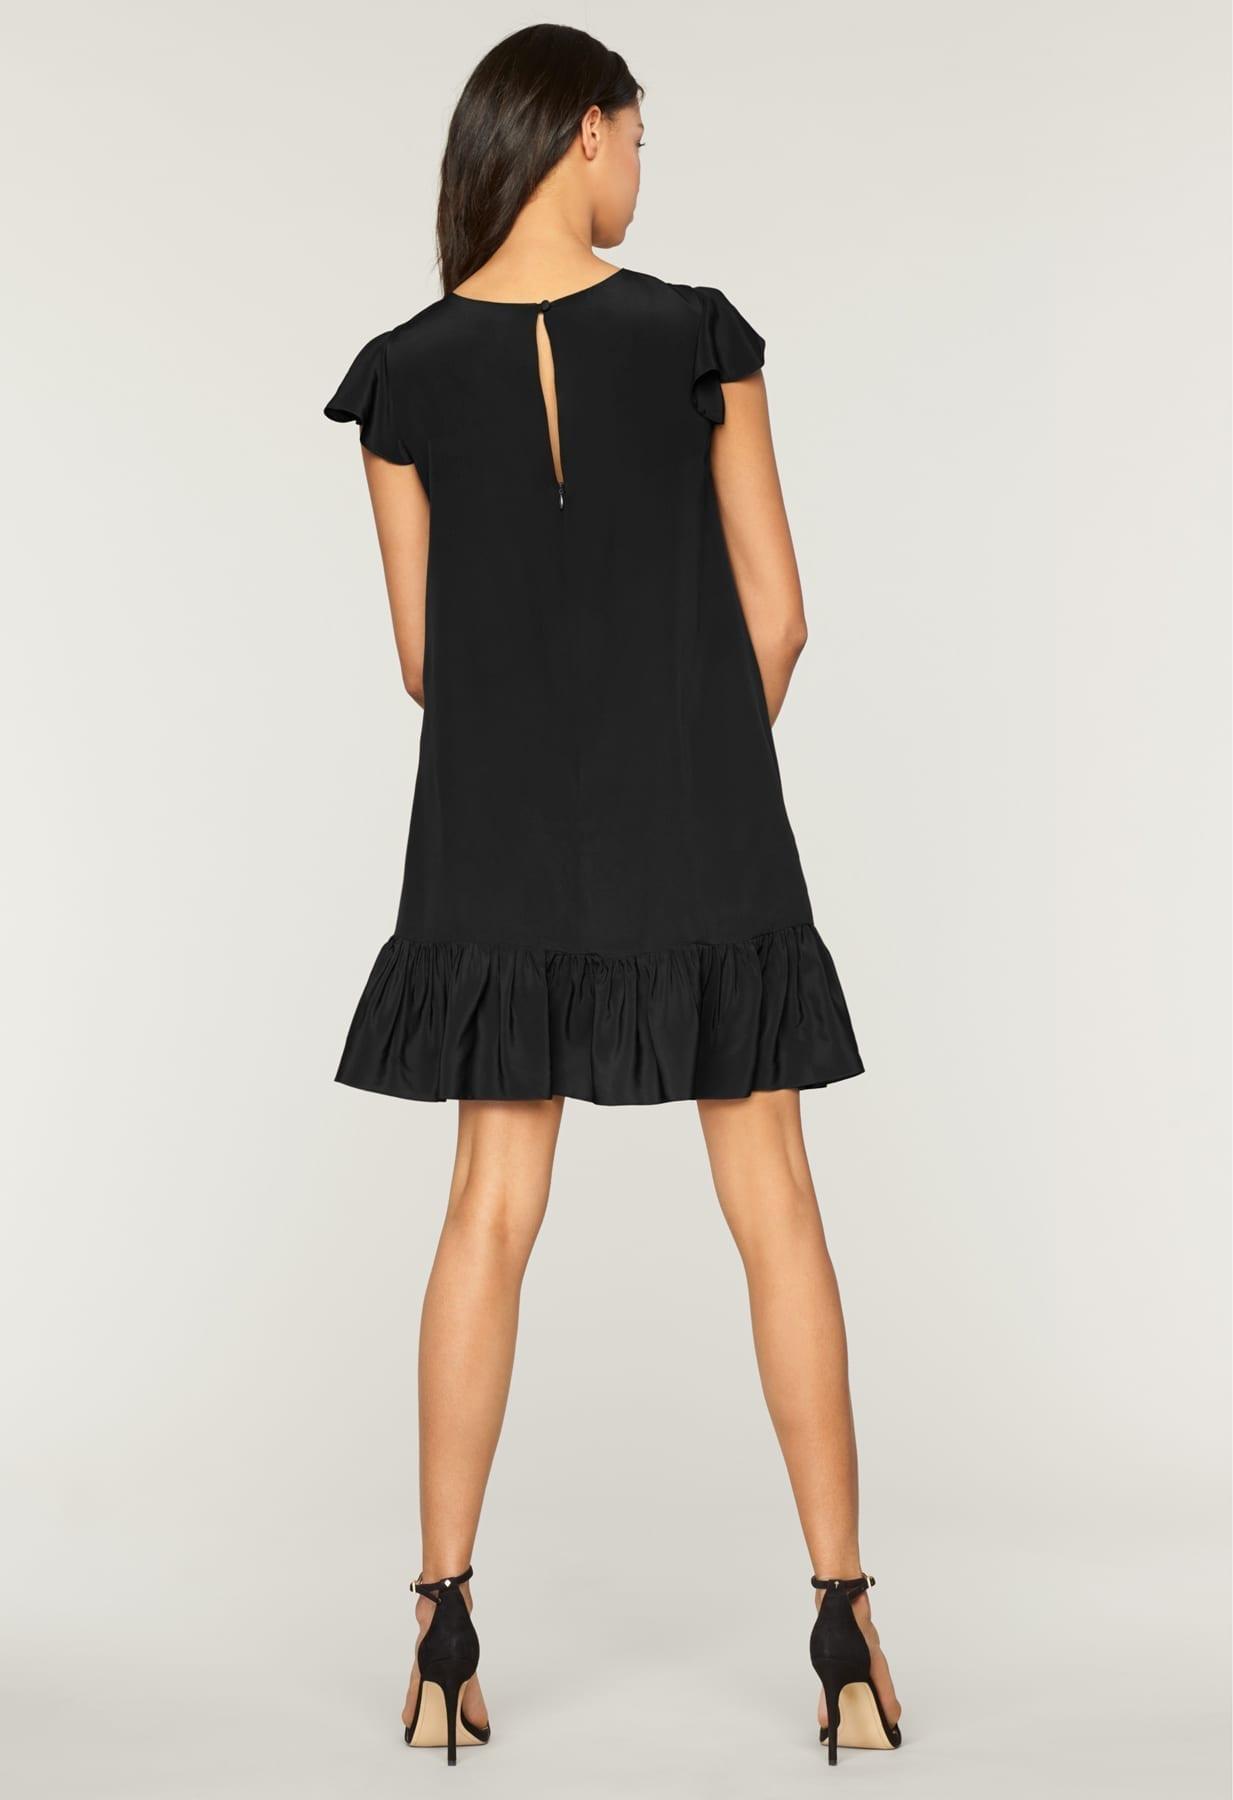 MILLY Washed Silk Jill Black Dress